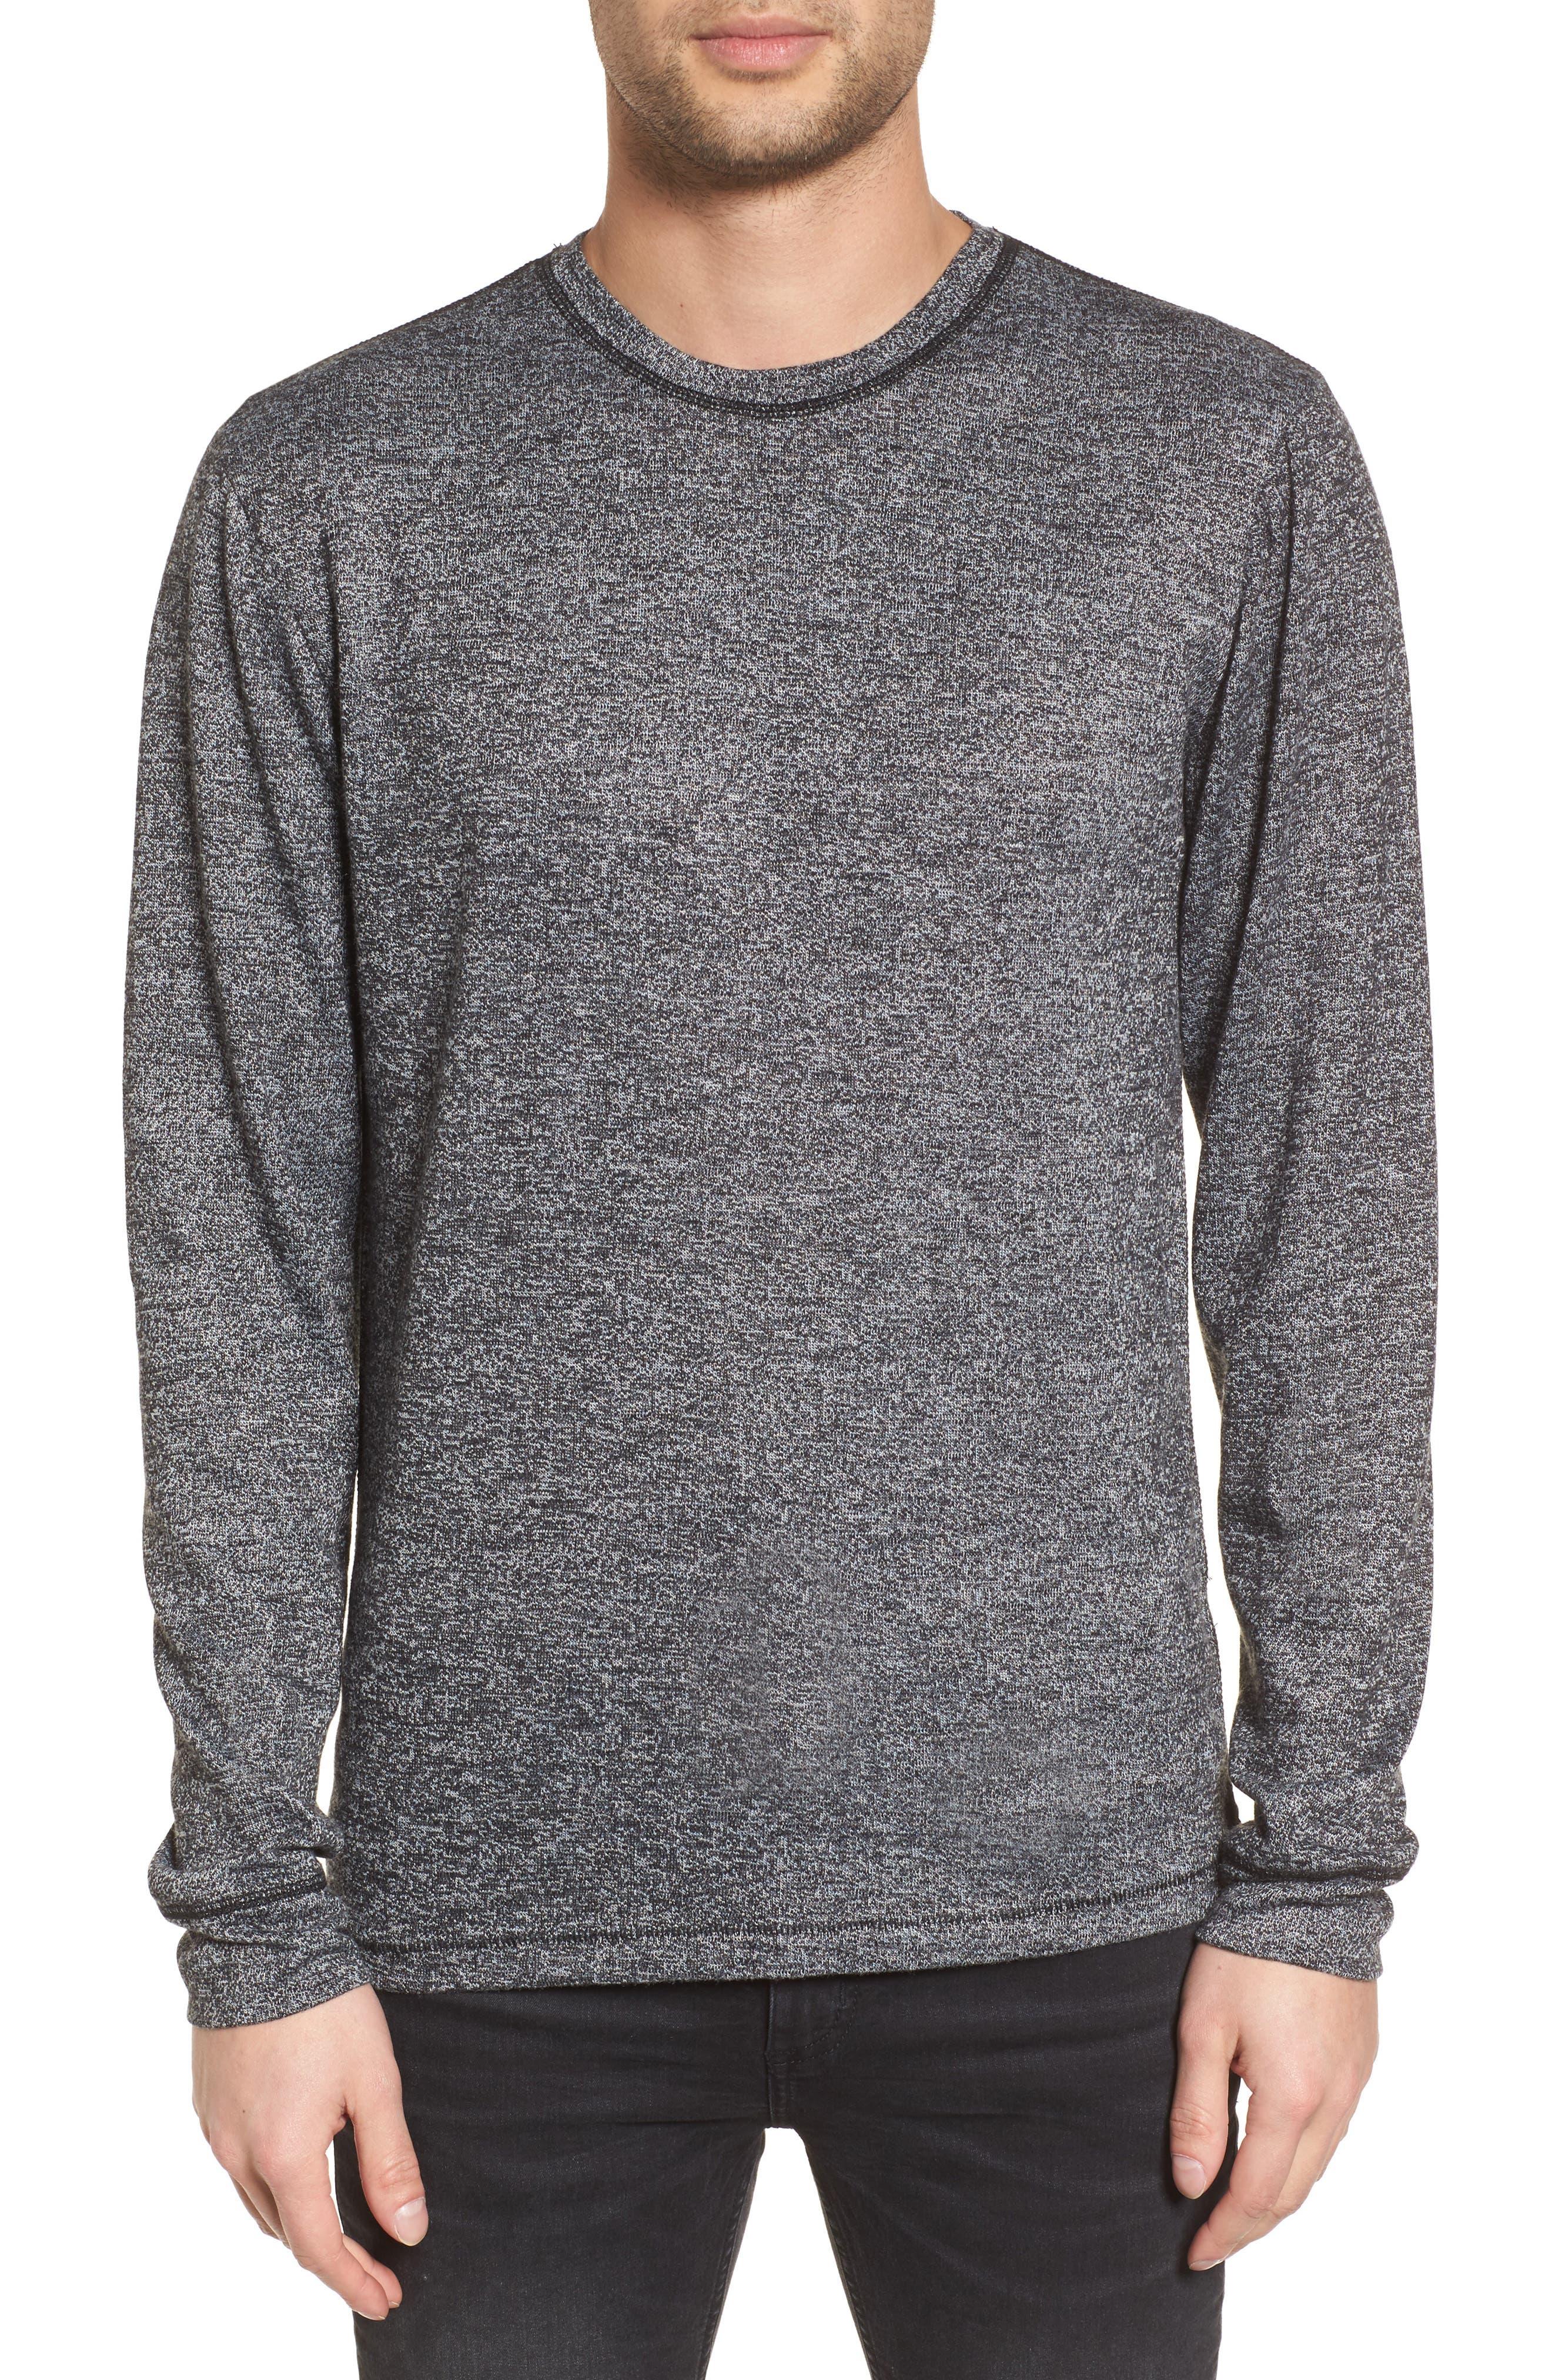 Treasure&Bond Crewneck Sweater,                             Main thumbnail 1, color,                             001